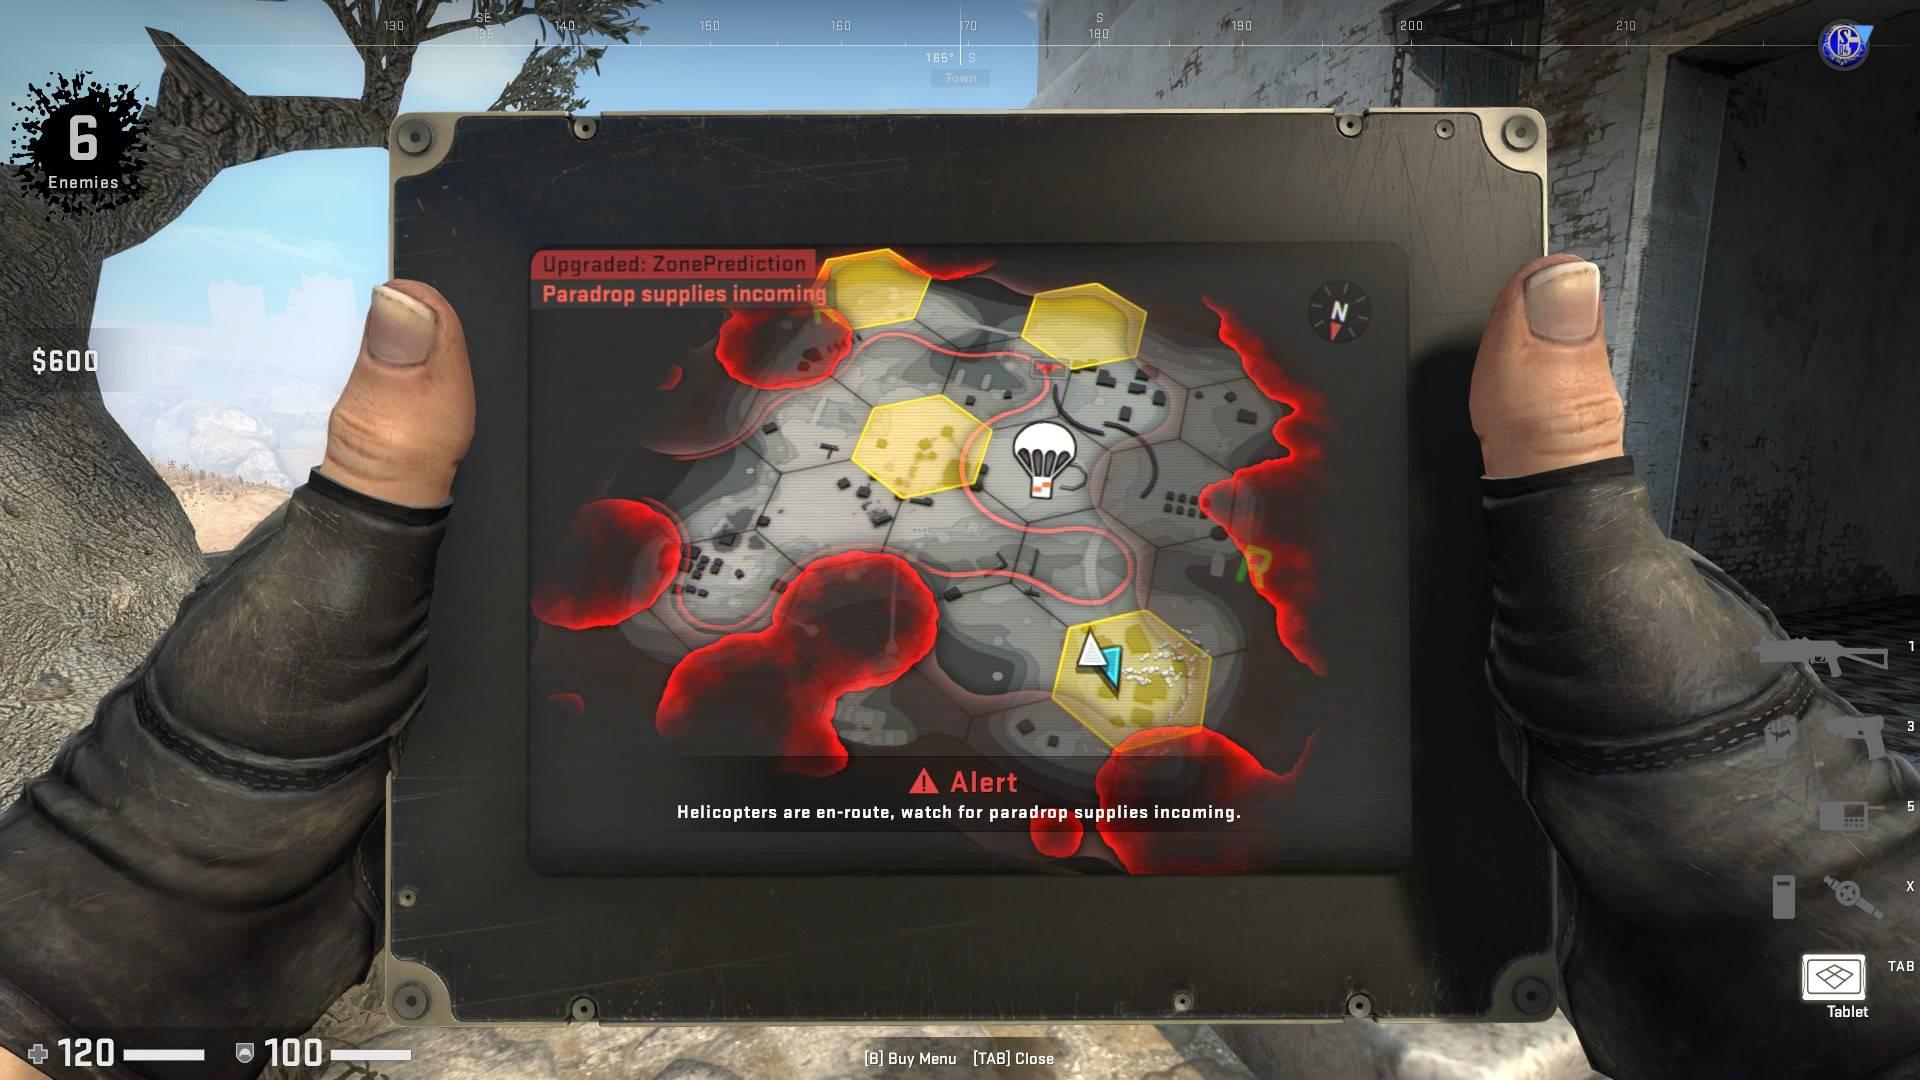 cs go danger zone tablet upgrade